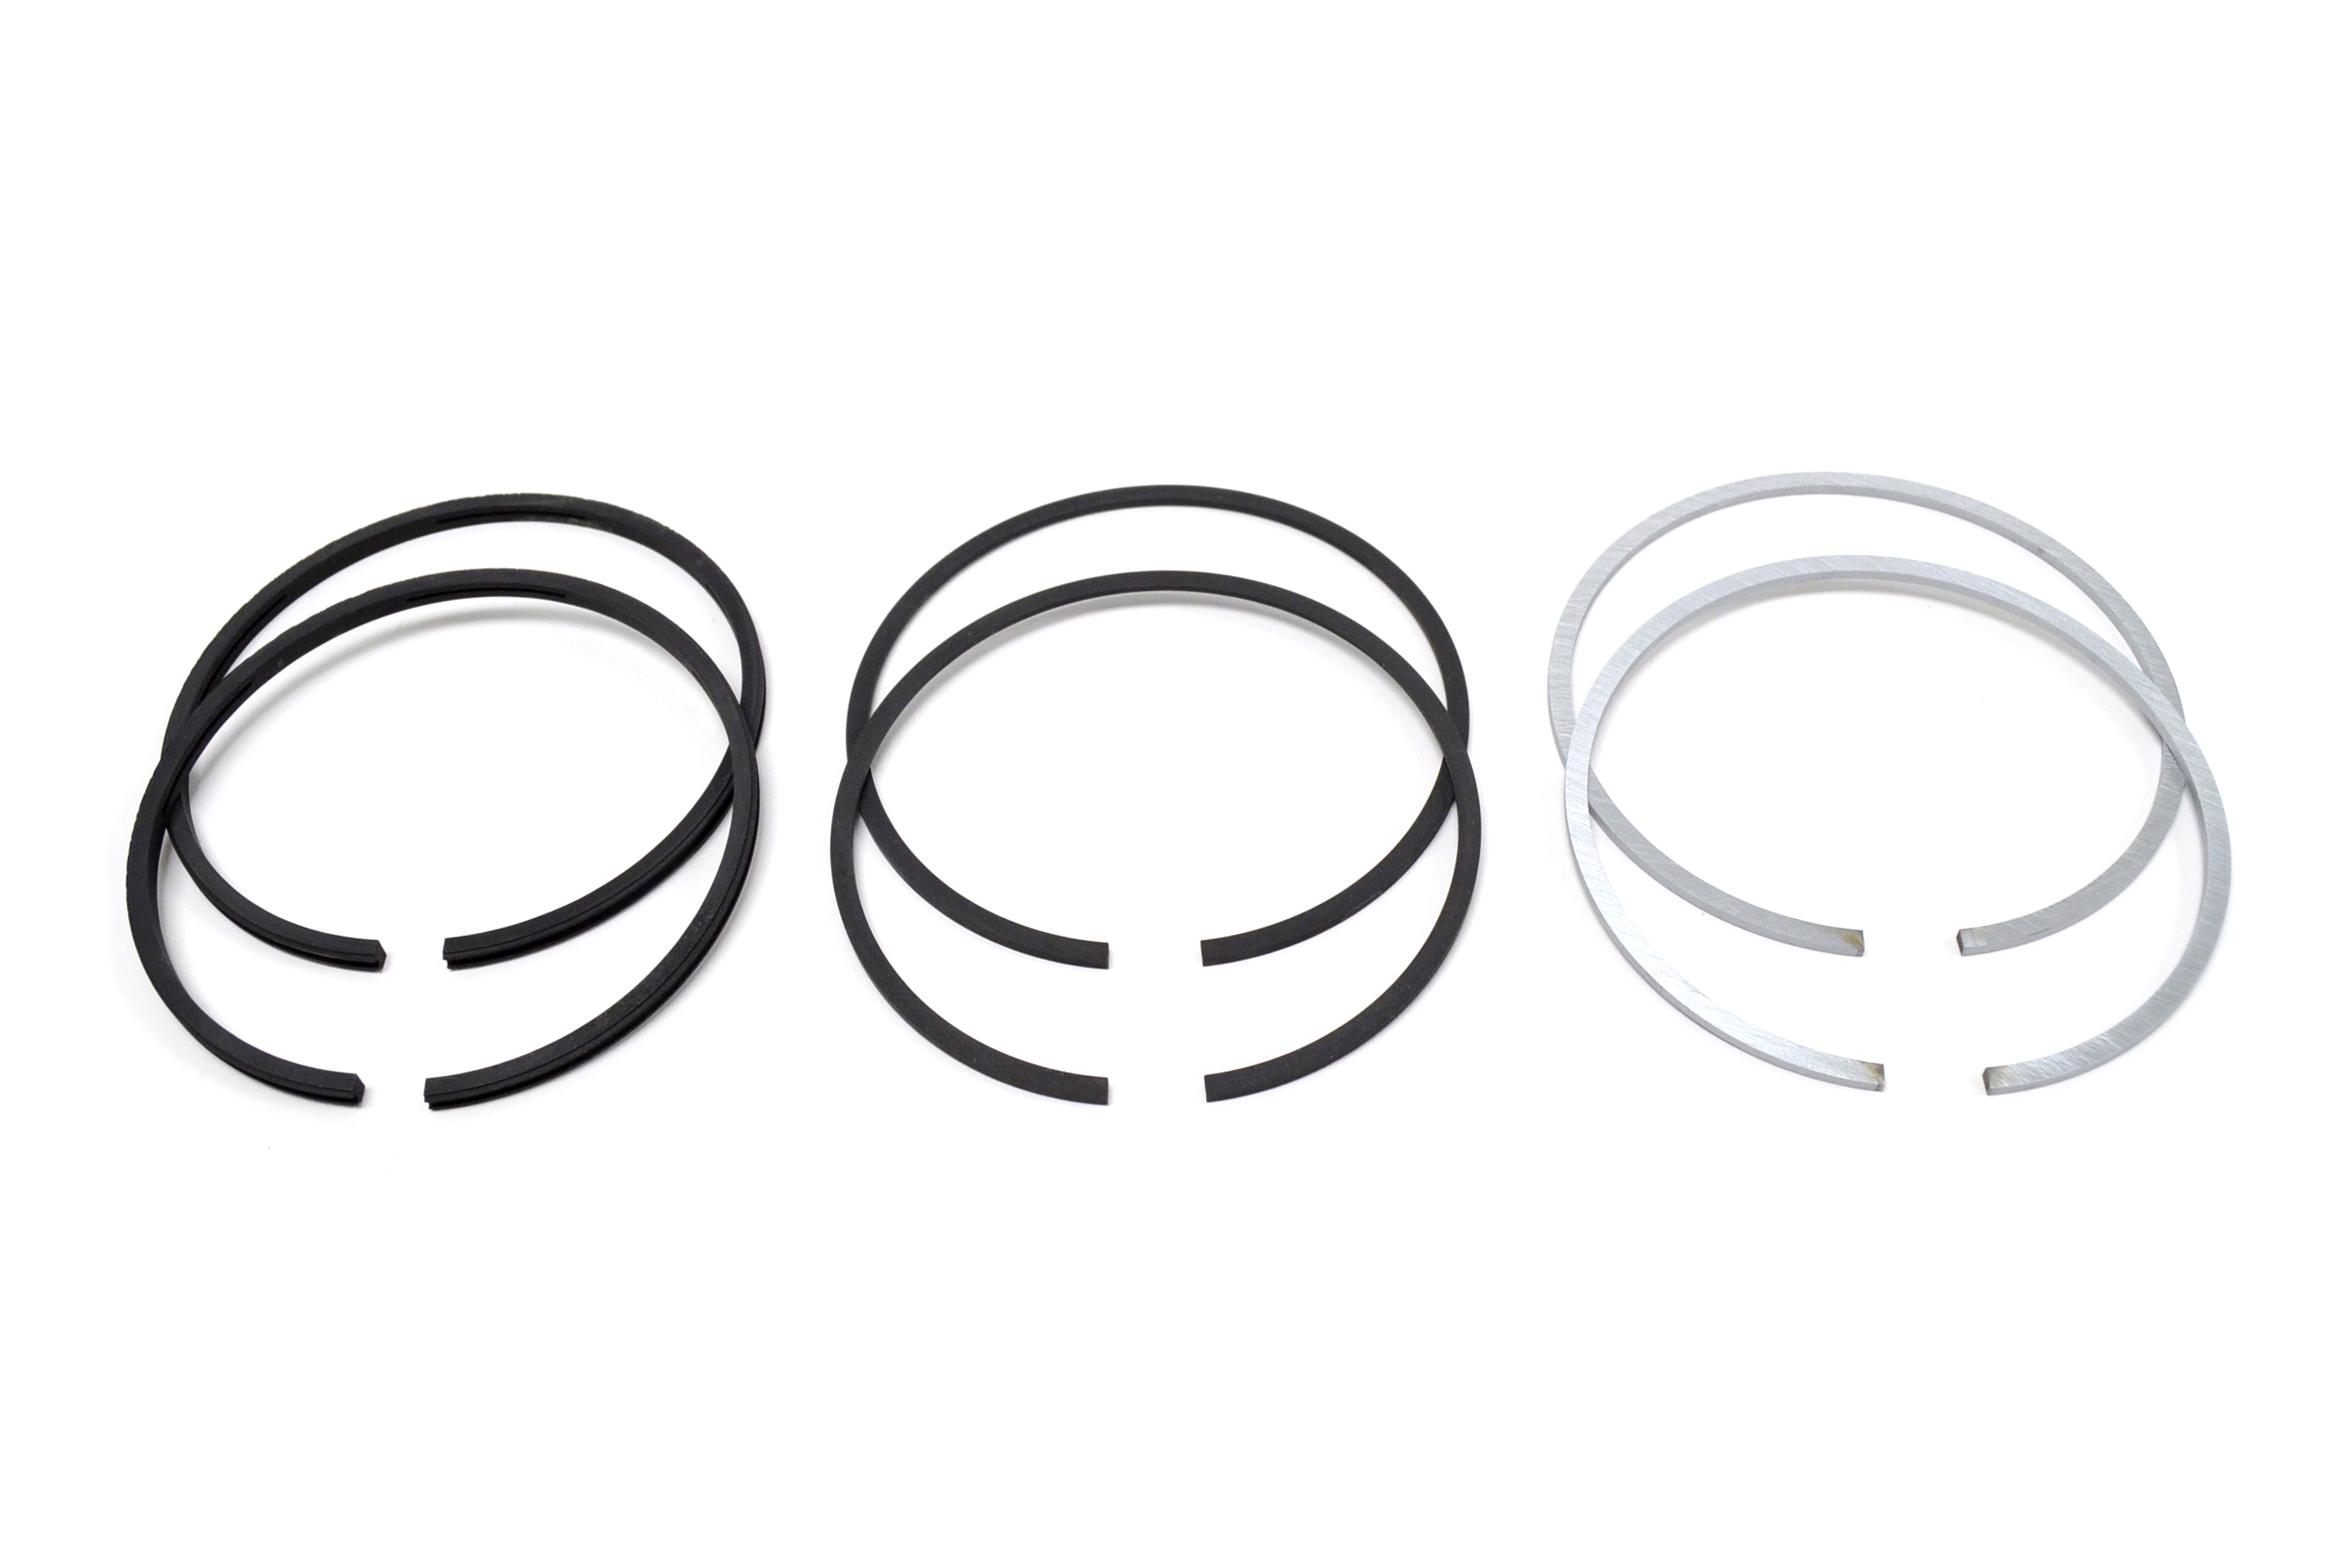 Norton Commando 750 Piston Ring Set Hastings 040 R